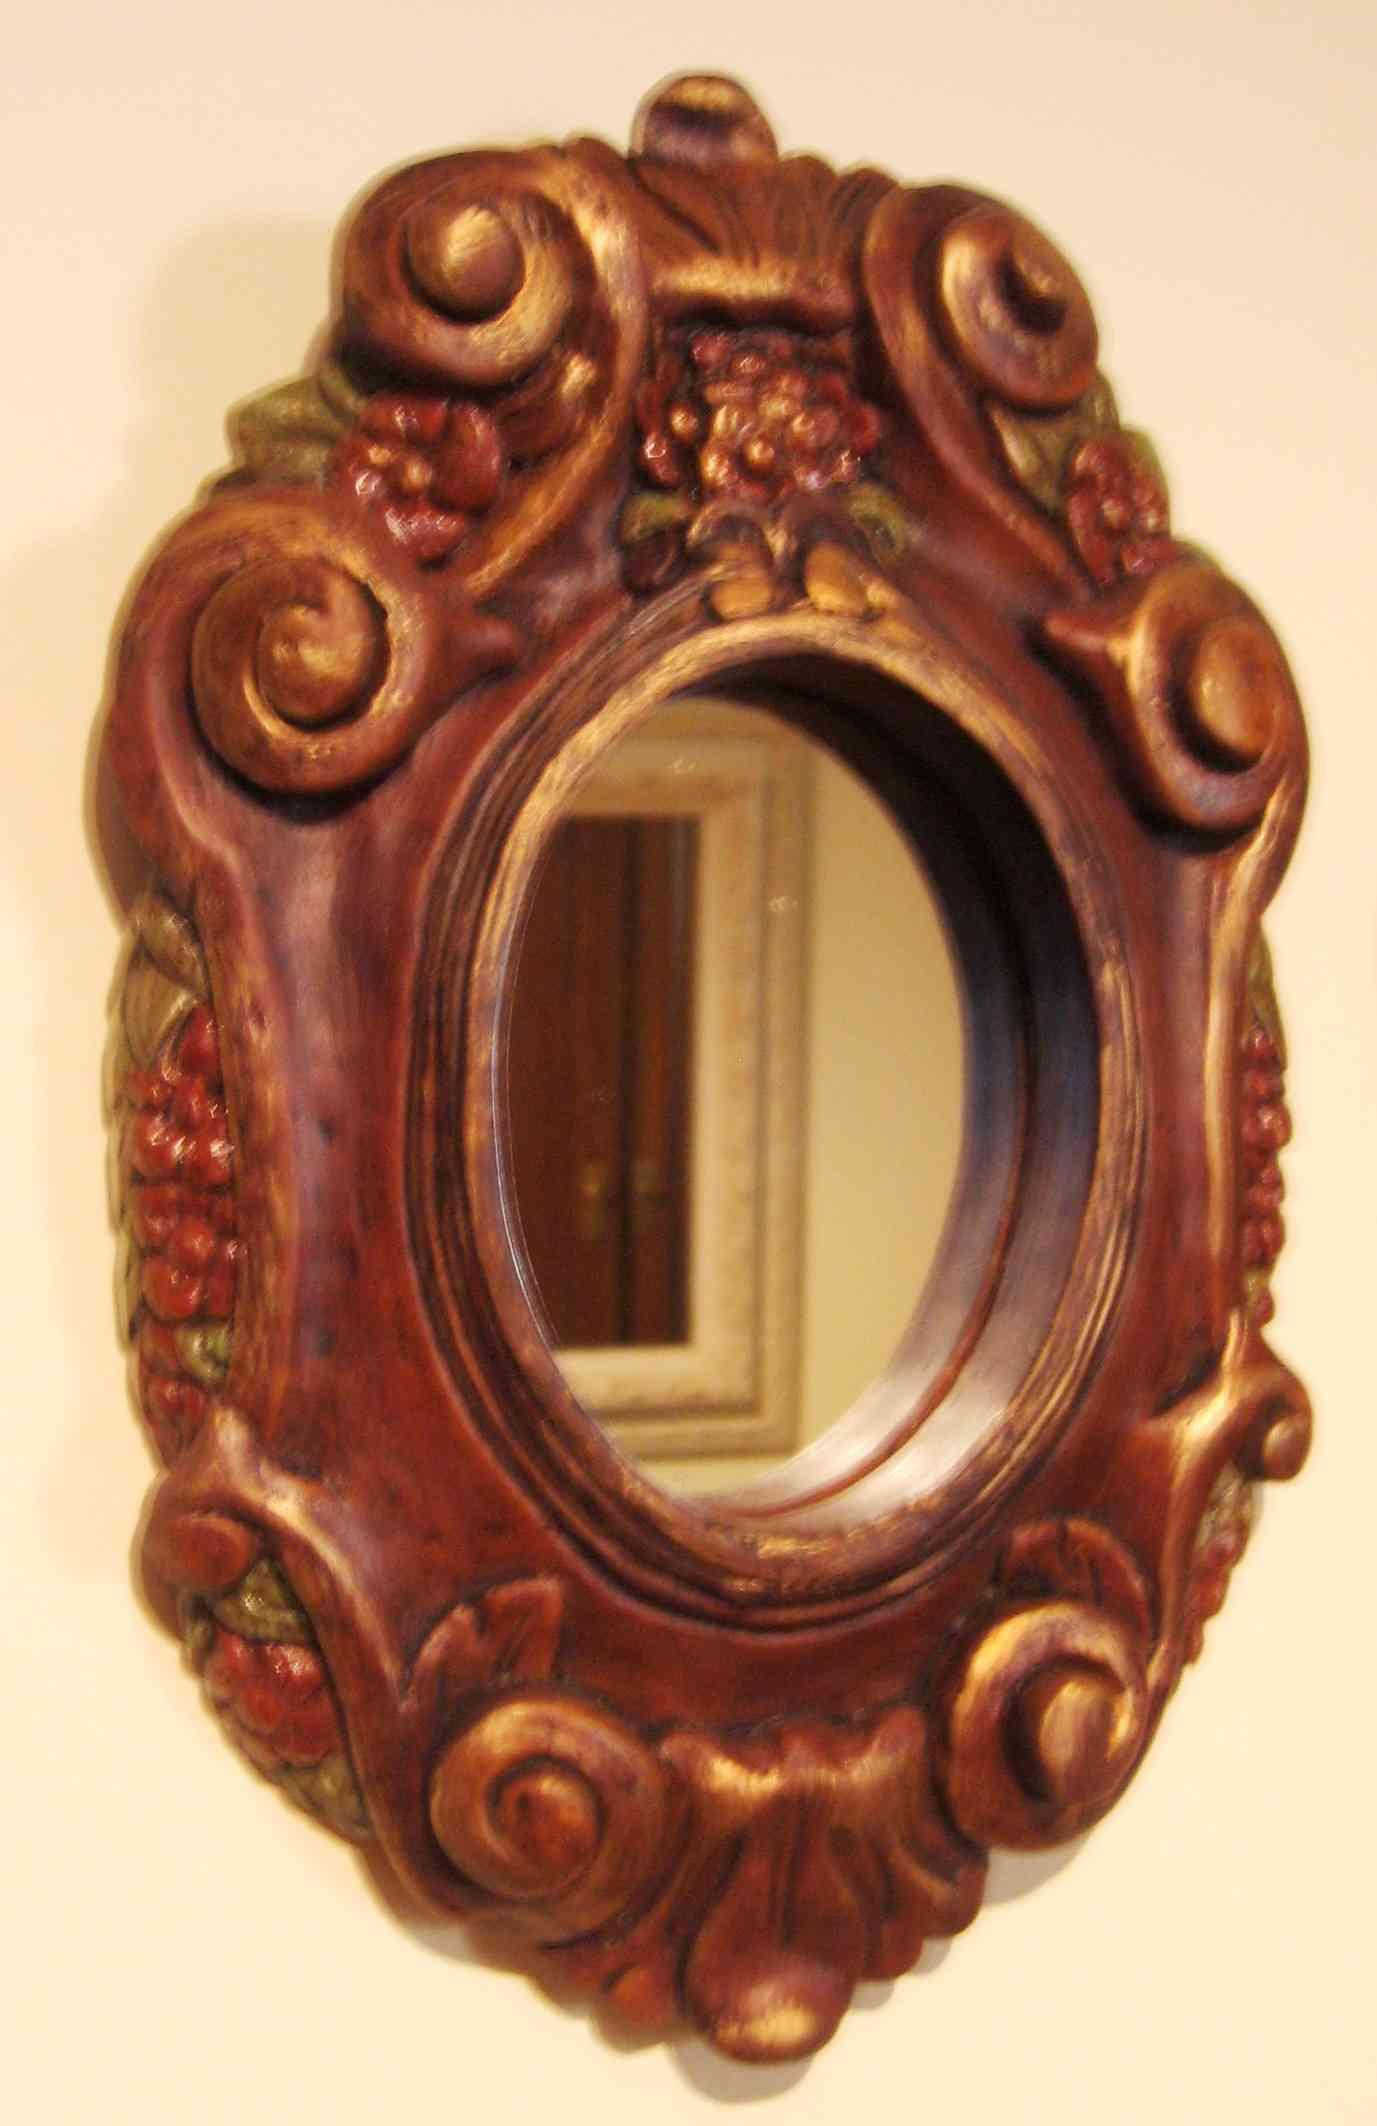 Espejo de resina decoraci n de interiores opendeco - Espejos de resina ...